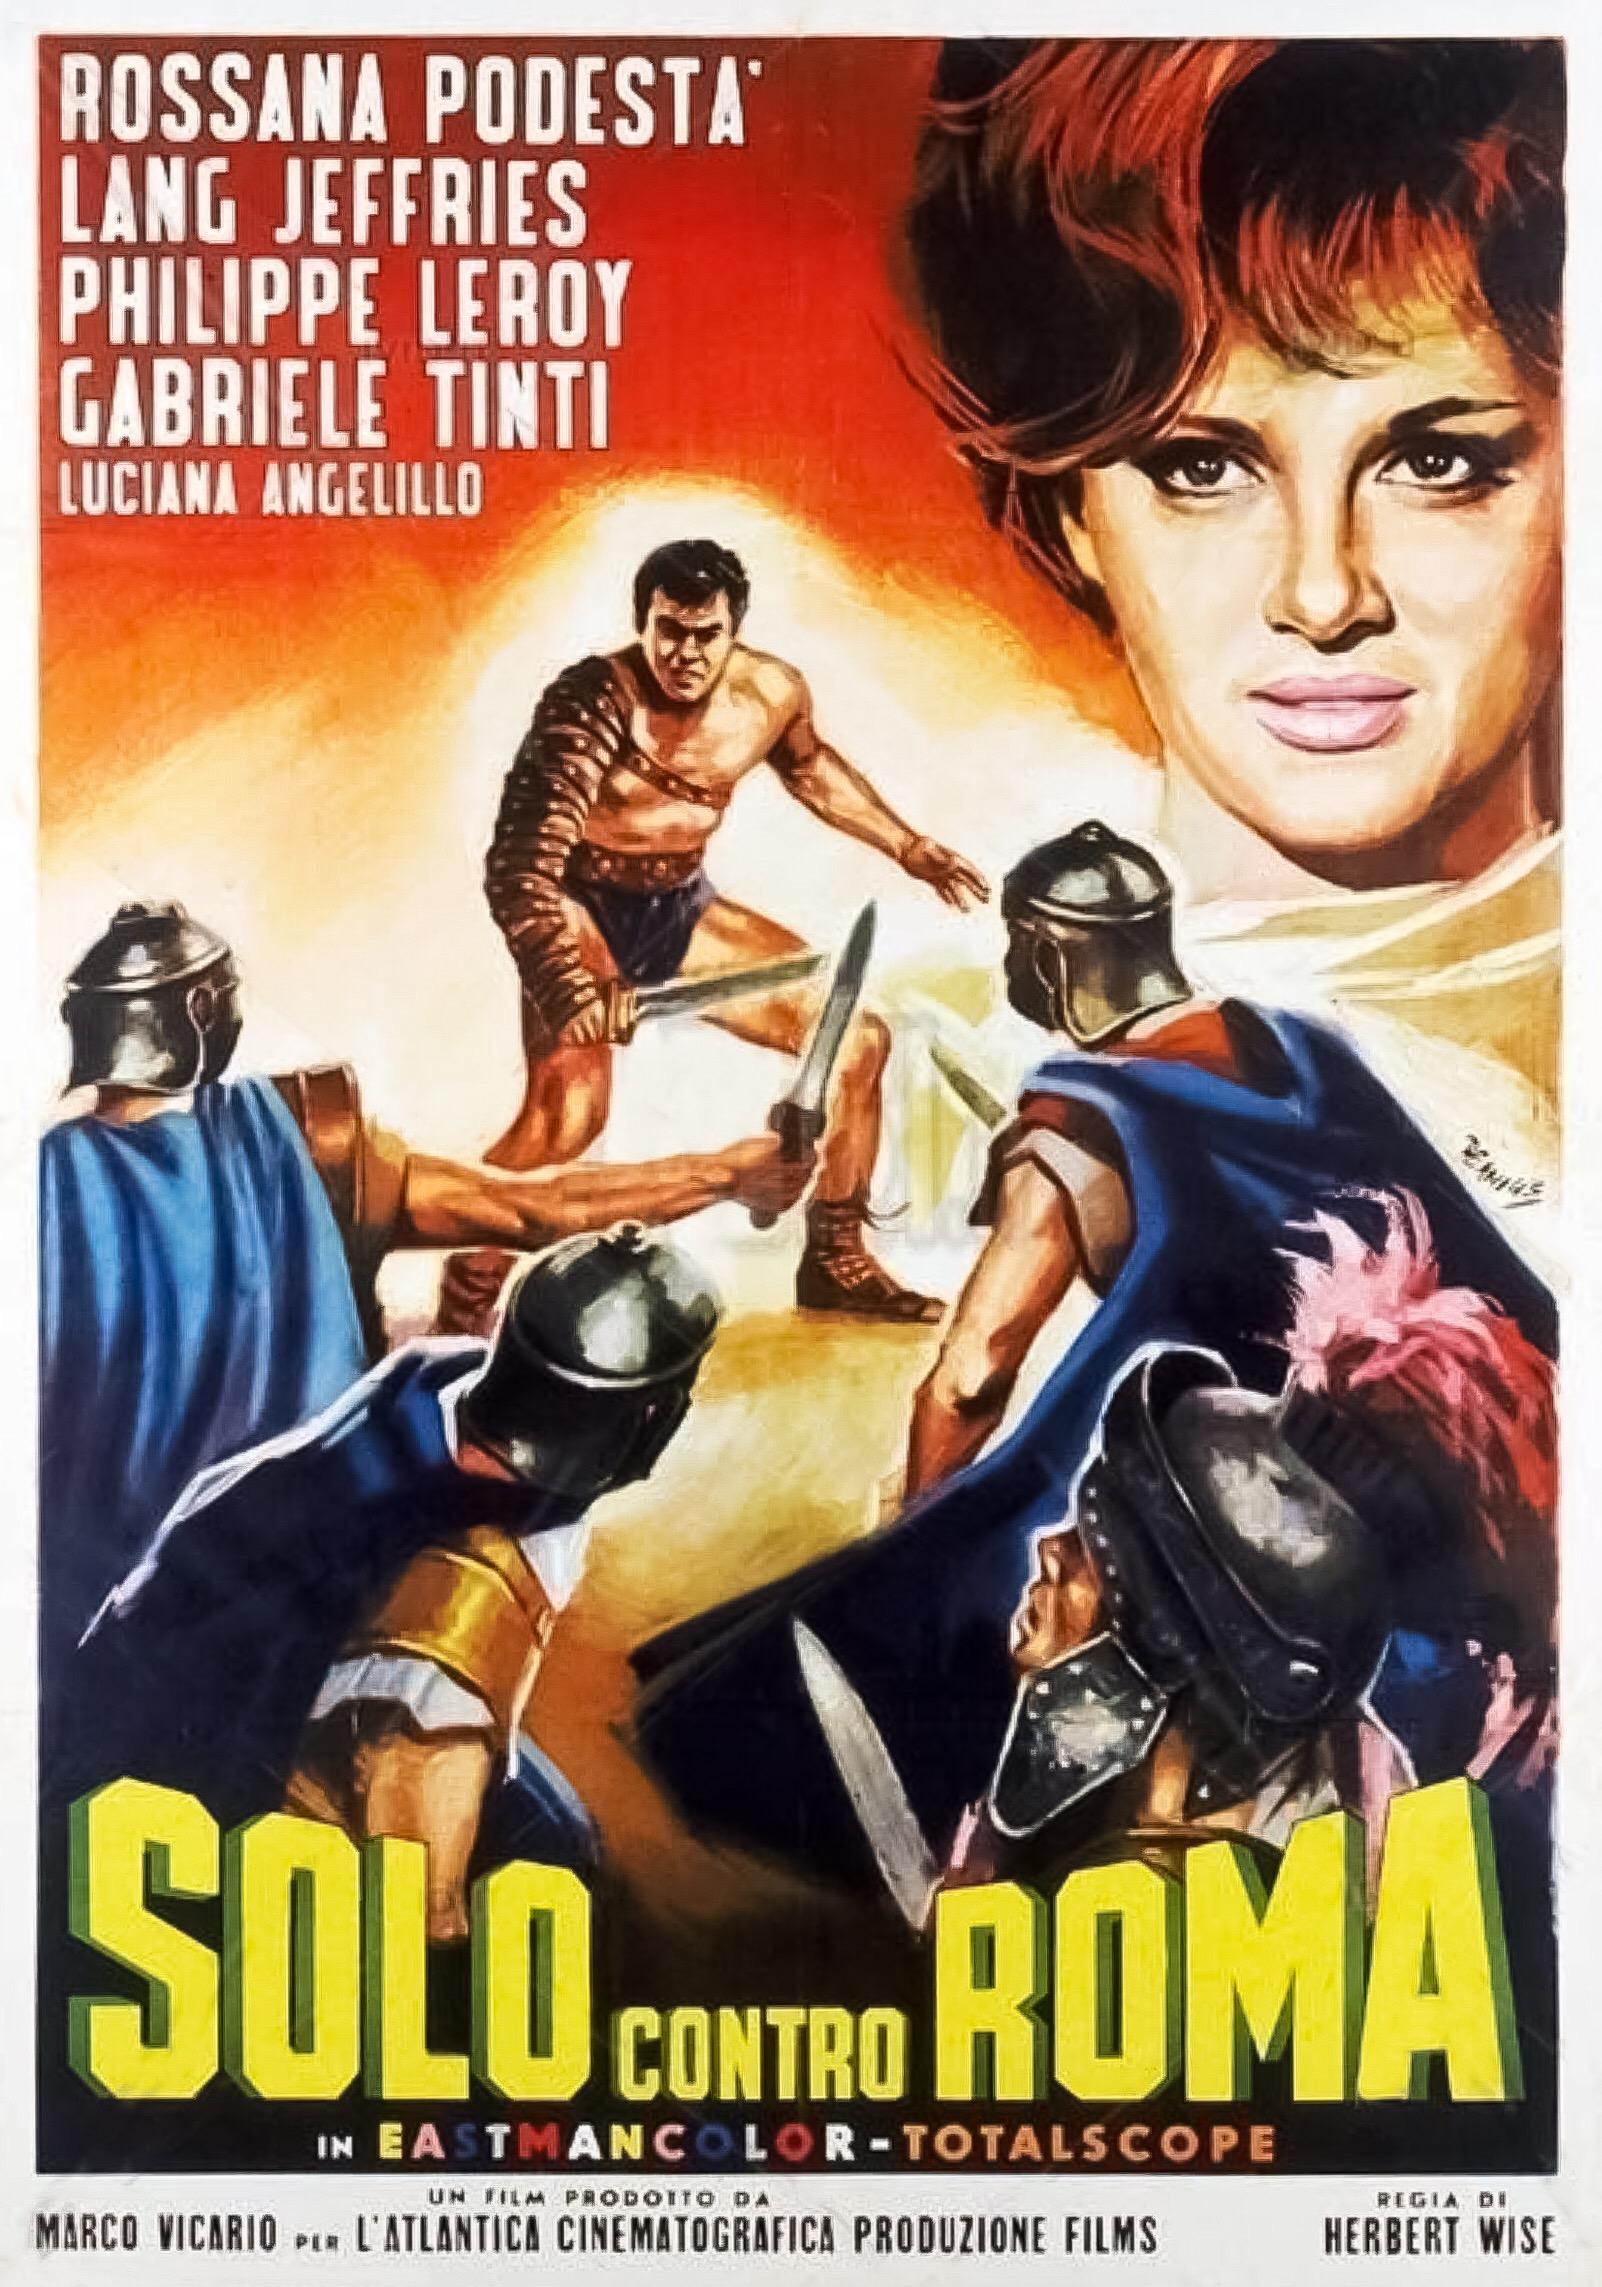 Philippe Leroy, Luciana Angiolillo, Lang Jeffries, Rossana Podestà, Luciano Ricci, and Gabriele Tinti in Solo contro Roma (1962)